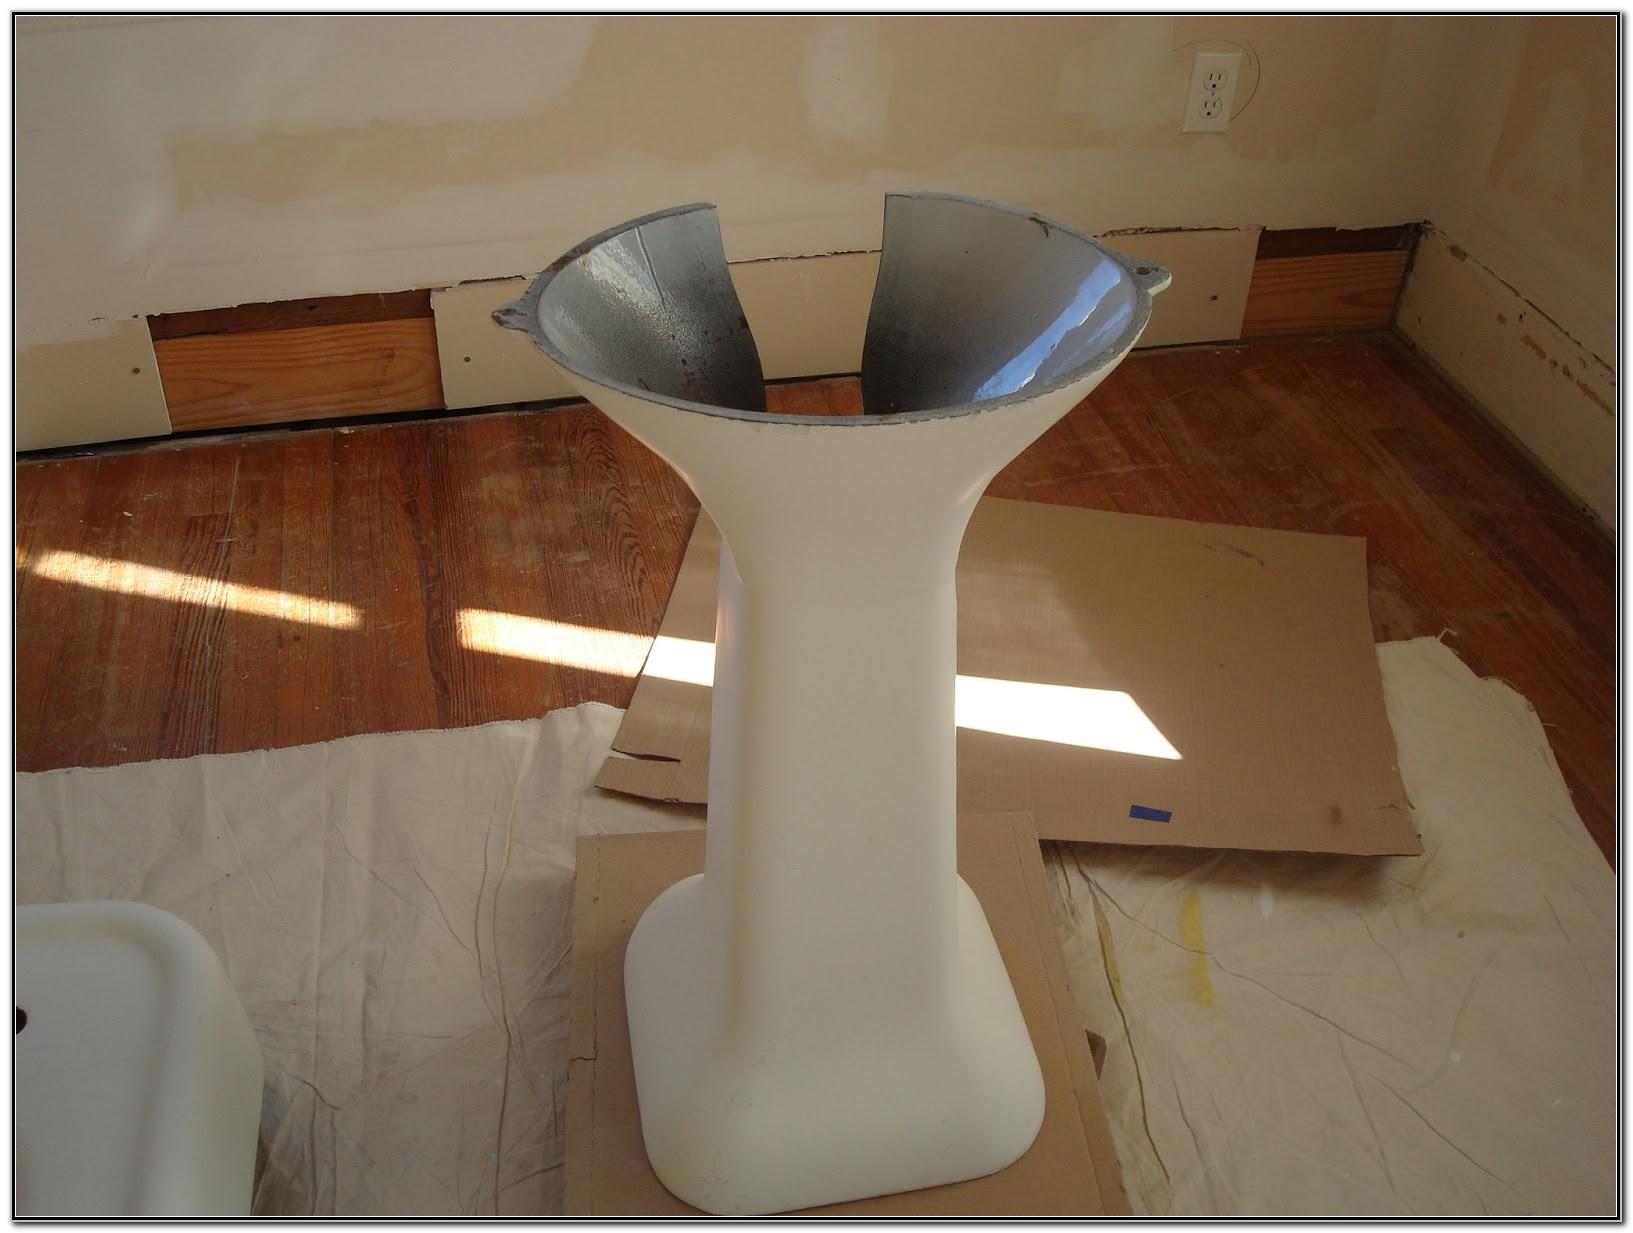 Cast Iron Sink Refinishing